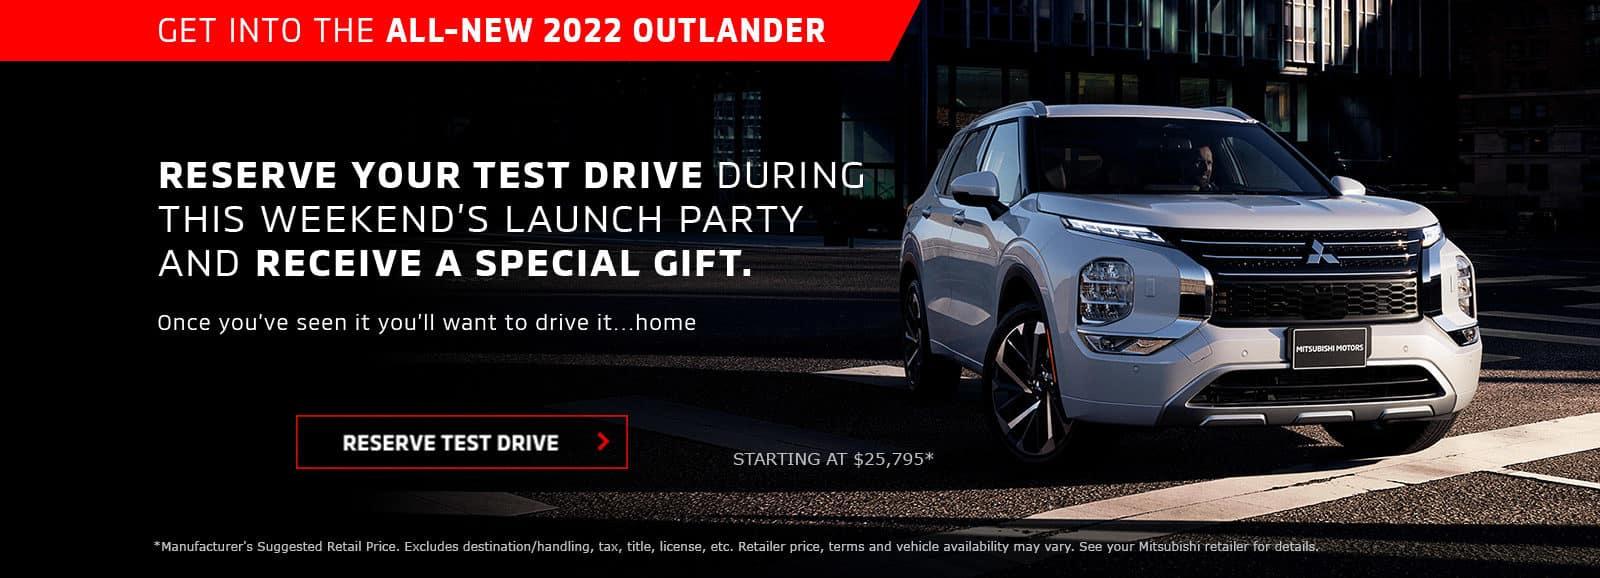 Outlander National Test Drive Launch Party Website Banners Outlander White Dealer Inspire 1600×578 MMNA_1600x578_OutlanderLaunchParty_DealerInspire_TestDrive_07-21.jpg